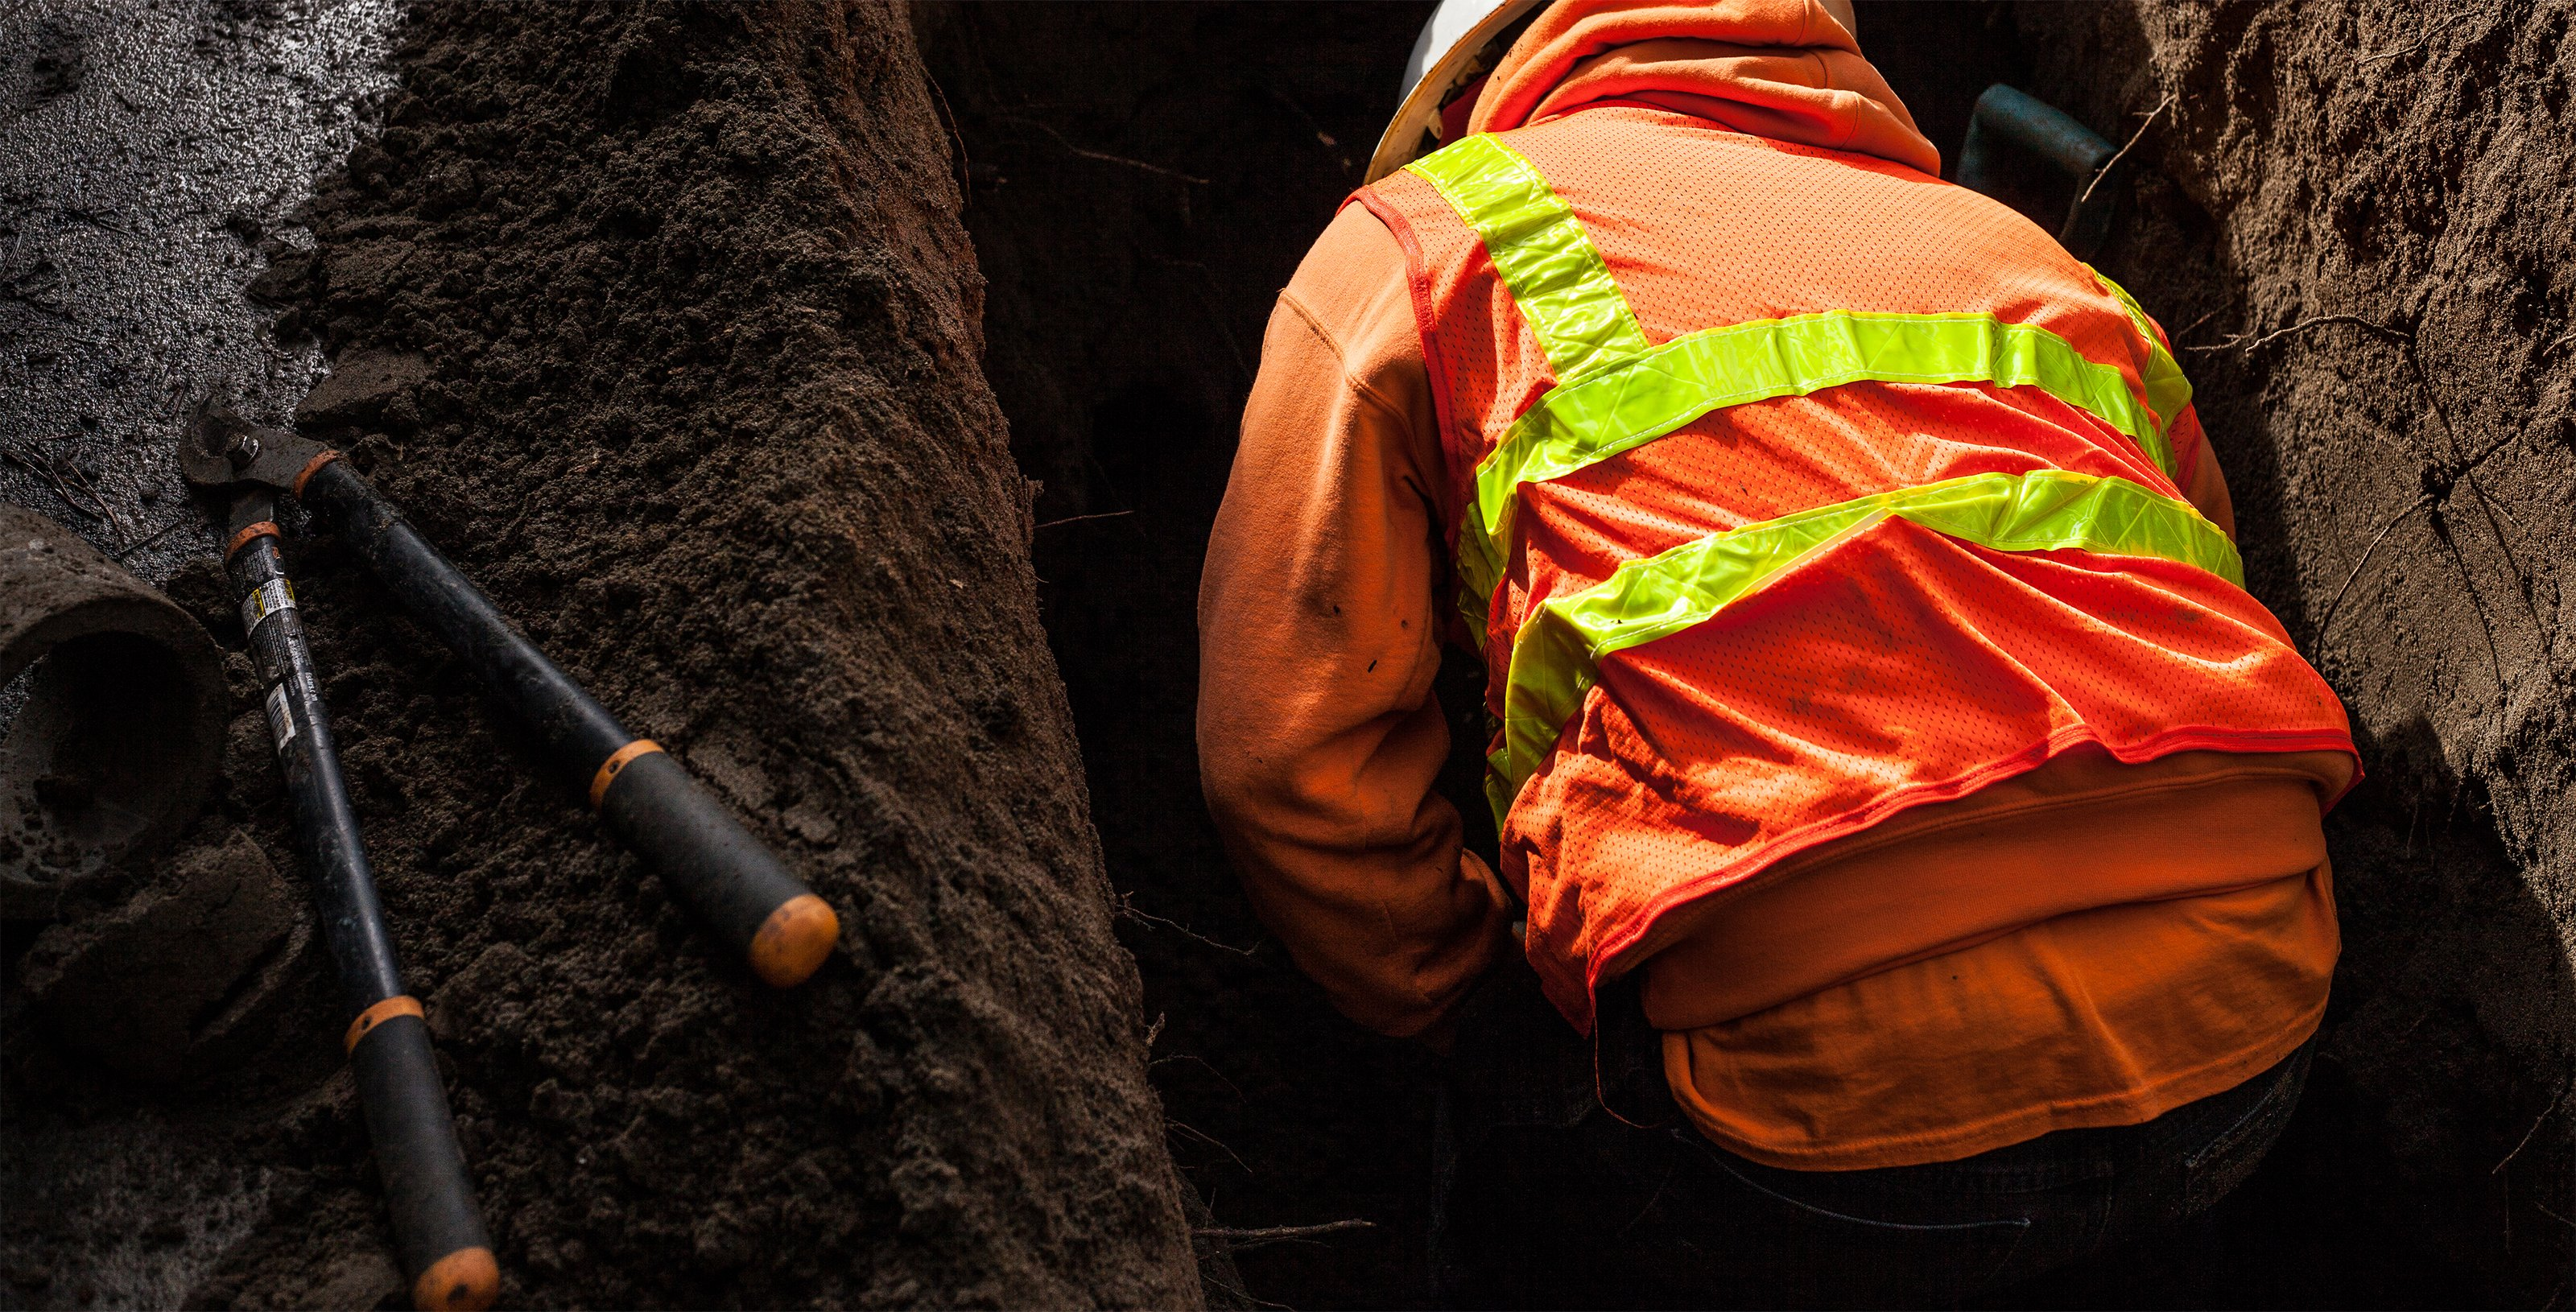 Sewer Services Company Iowa City, IA